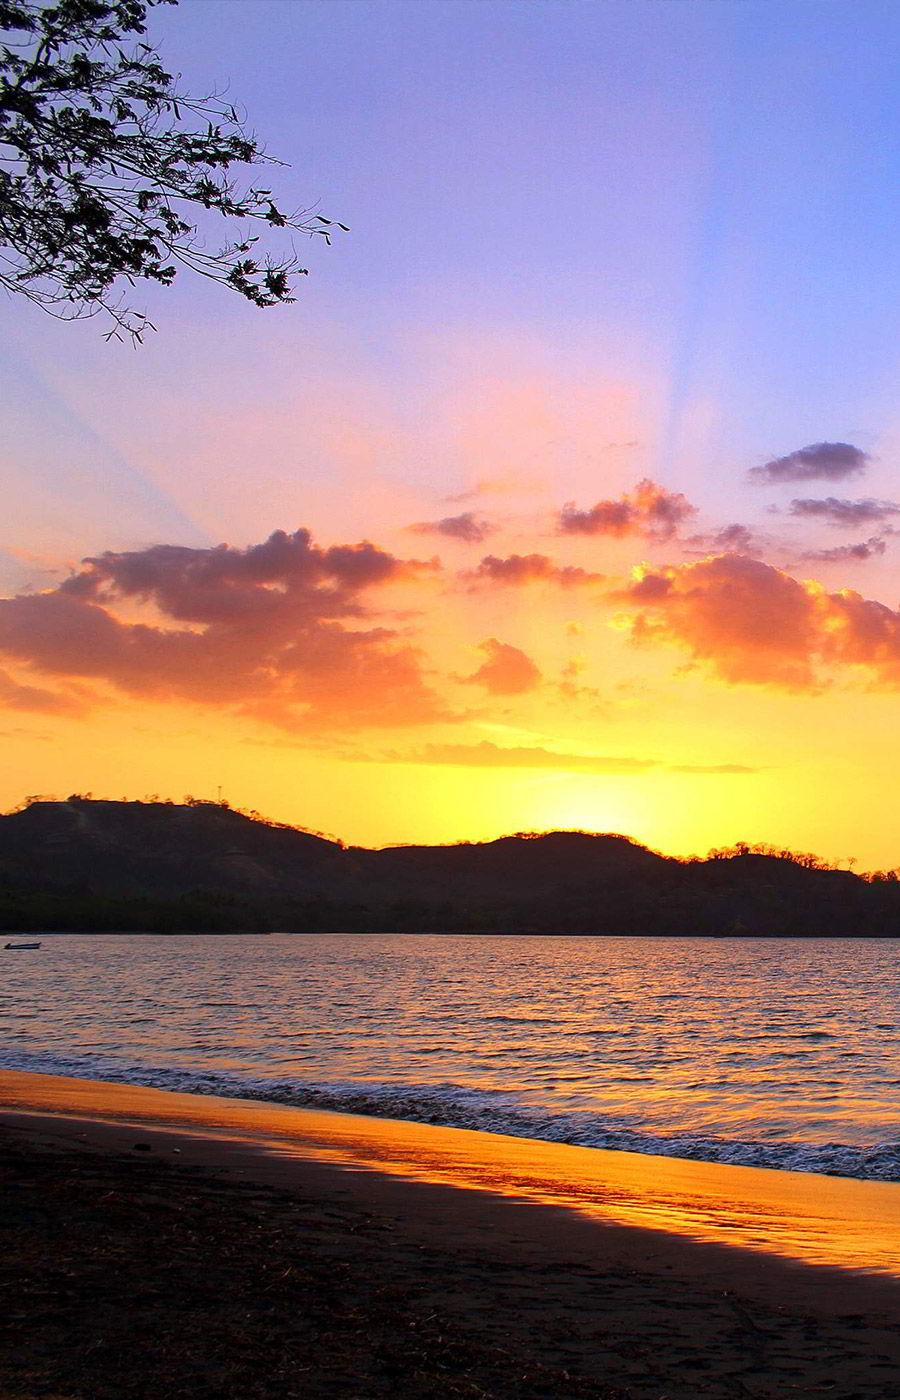 el mangroove guanacaste costa rica honeymoon destination wedding venue playa panama beach sunset